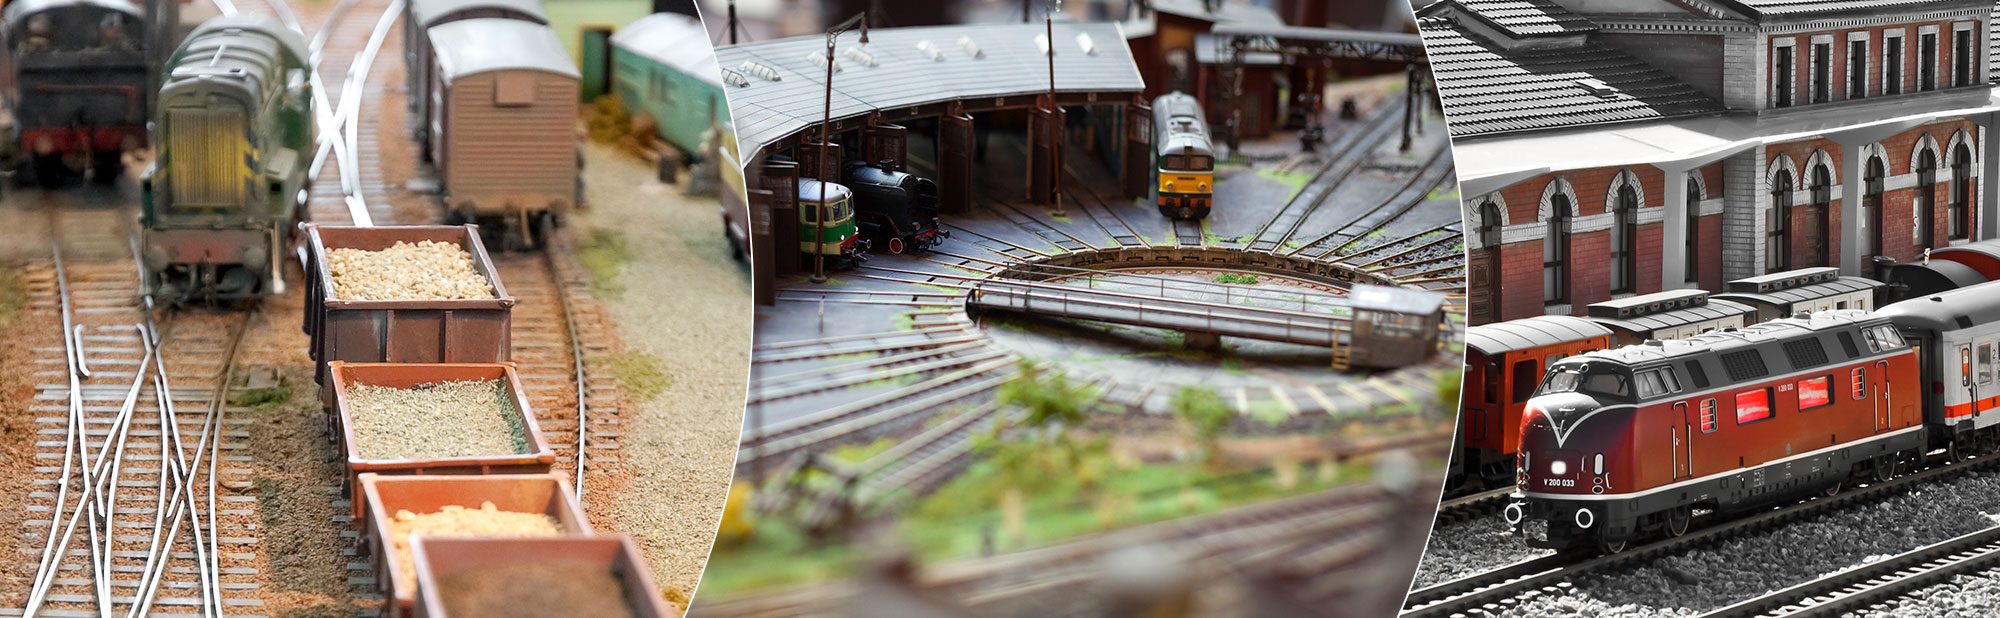 home railmodeller proRailmodeller Pro 6 Nu Community Layouts #20